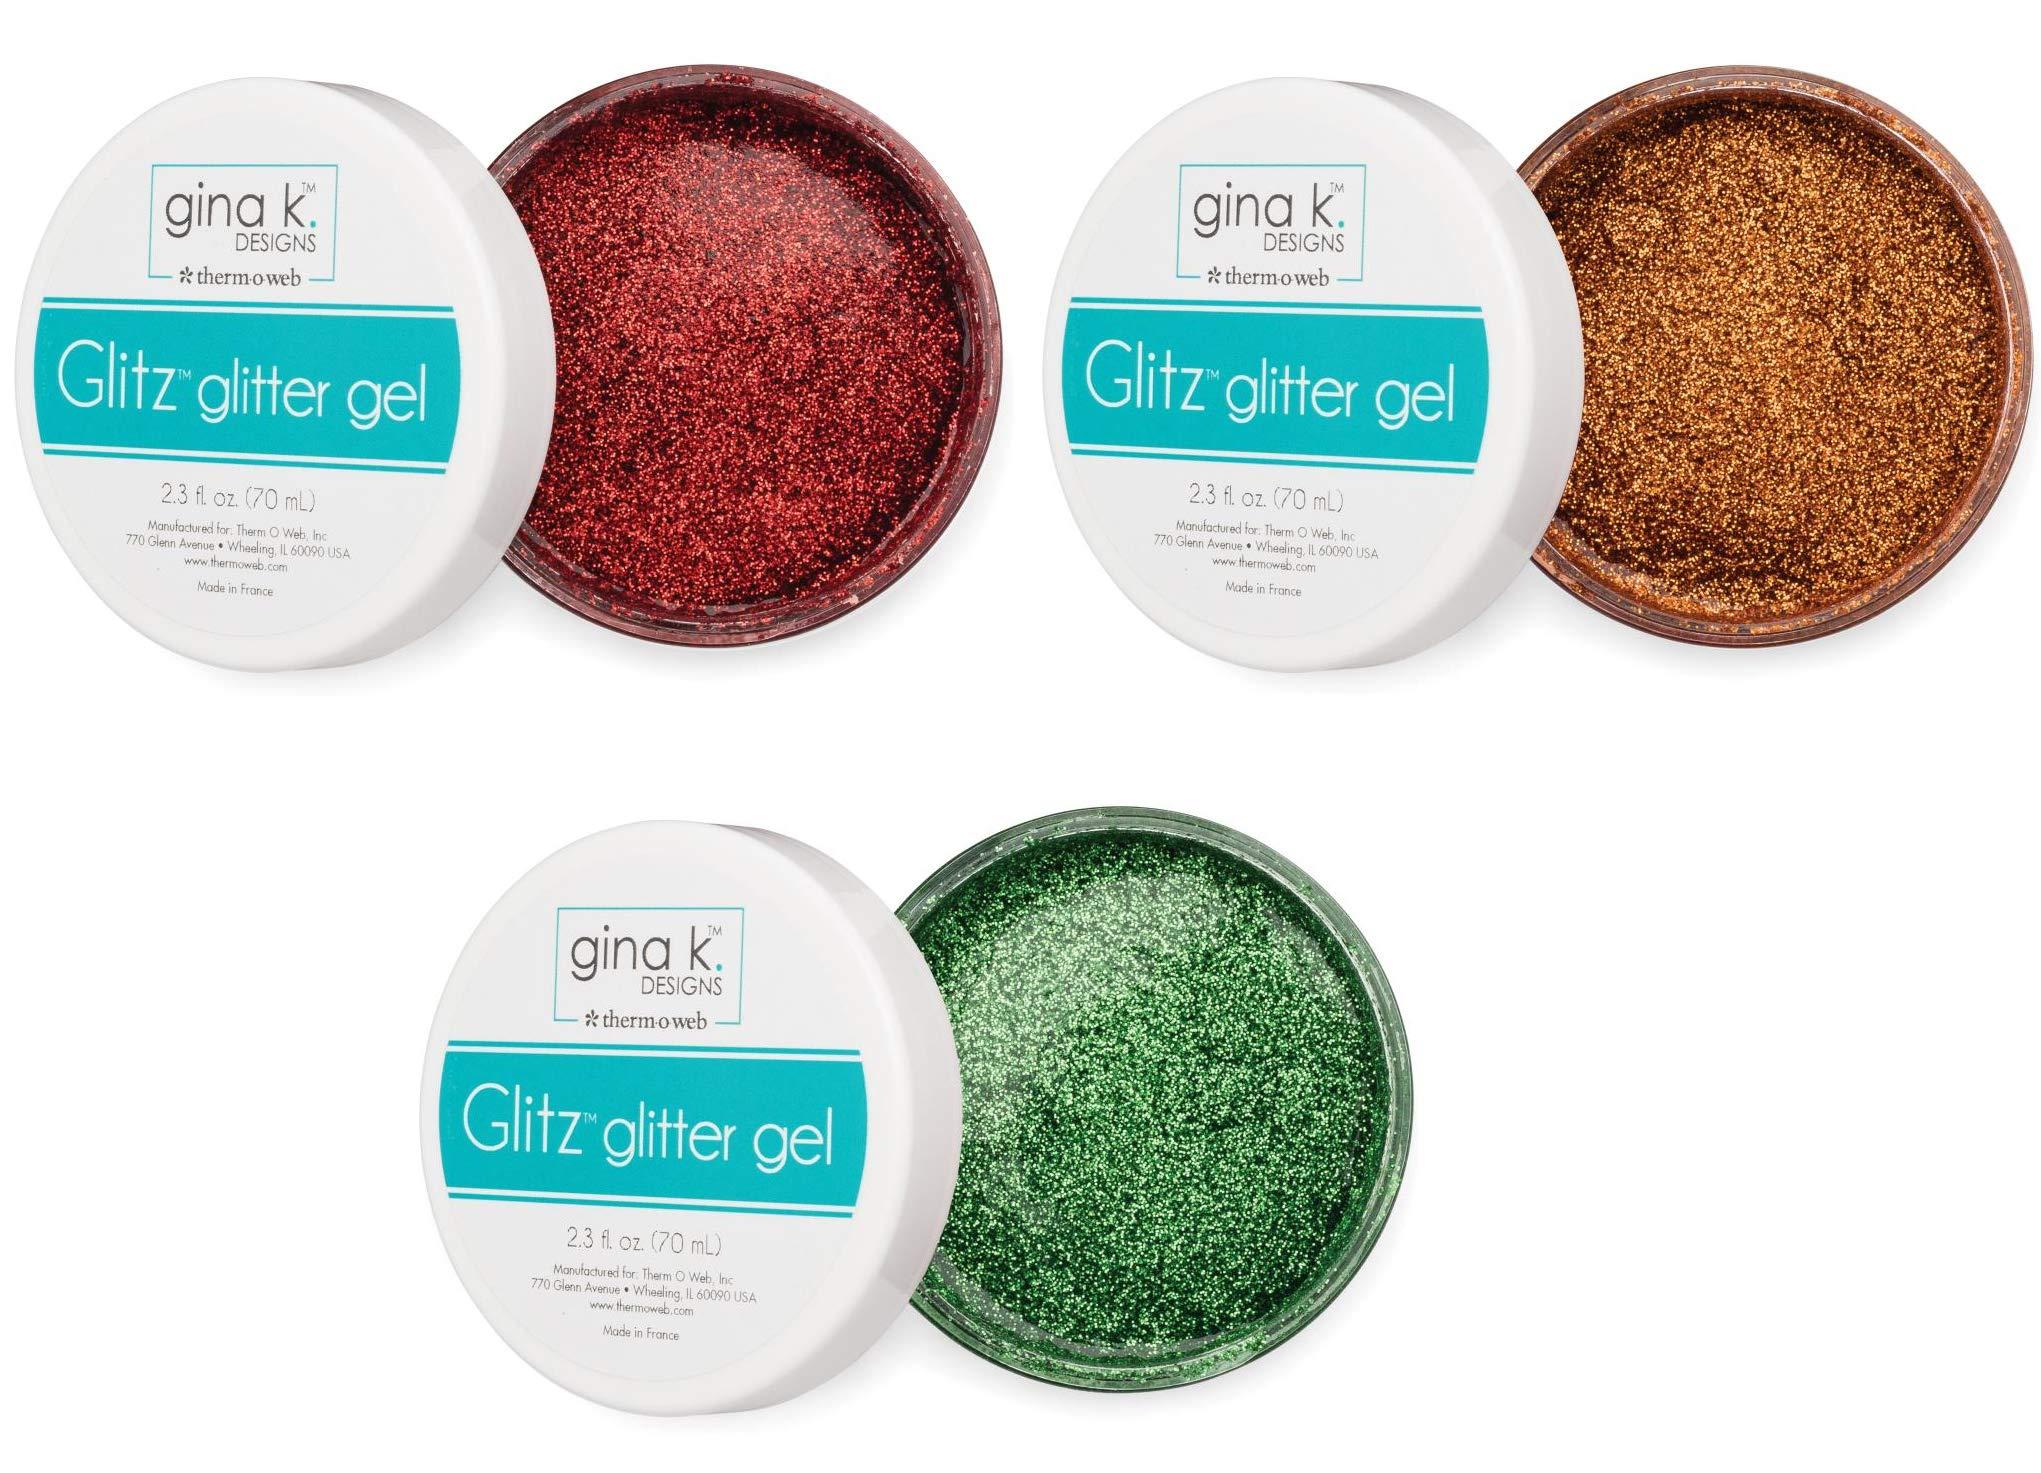 Gina K Designs Glitz Glitter Gel - Red Velvet, Sweet Mango and Grass Green - 3 Items